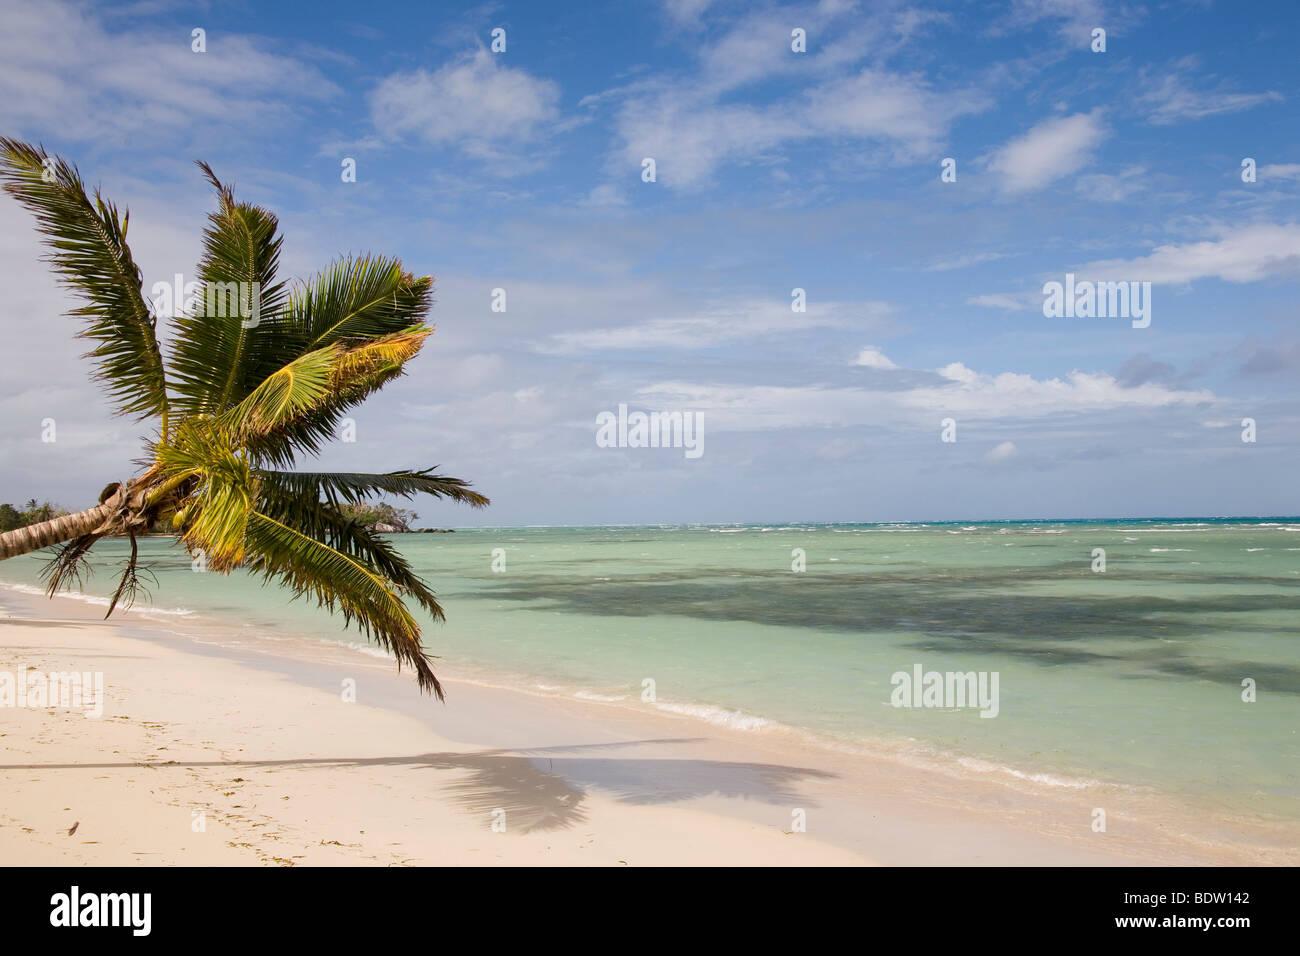 Strand von Nosy Nato, Madagaskar, Afrika, beach of Nosy, Madagascar, Africa - Stock Image